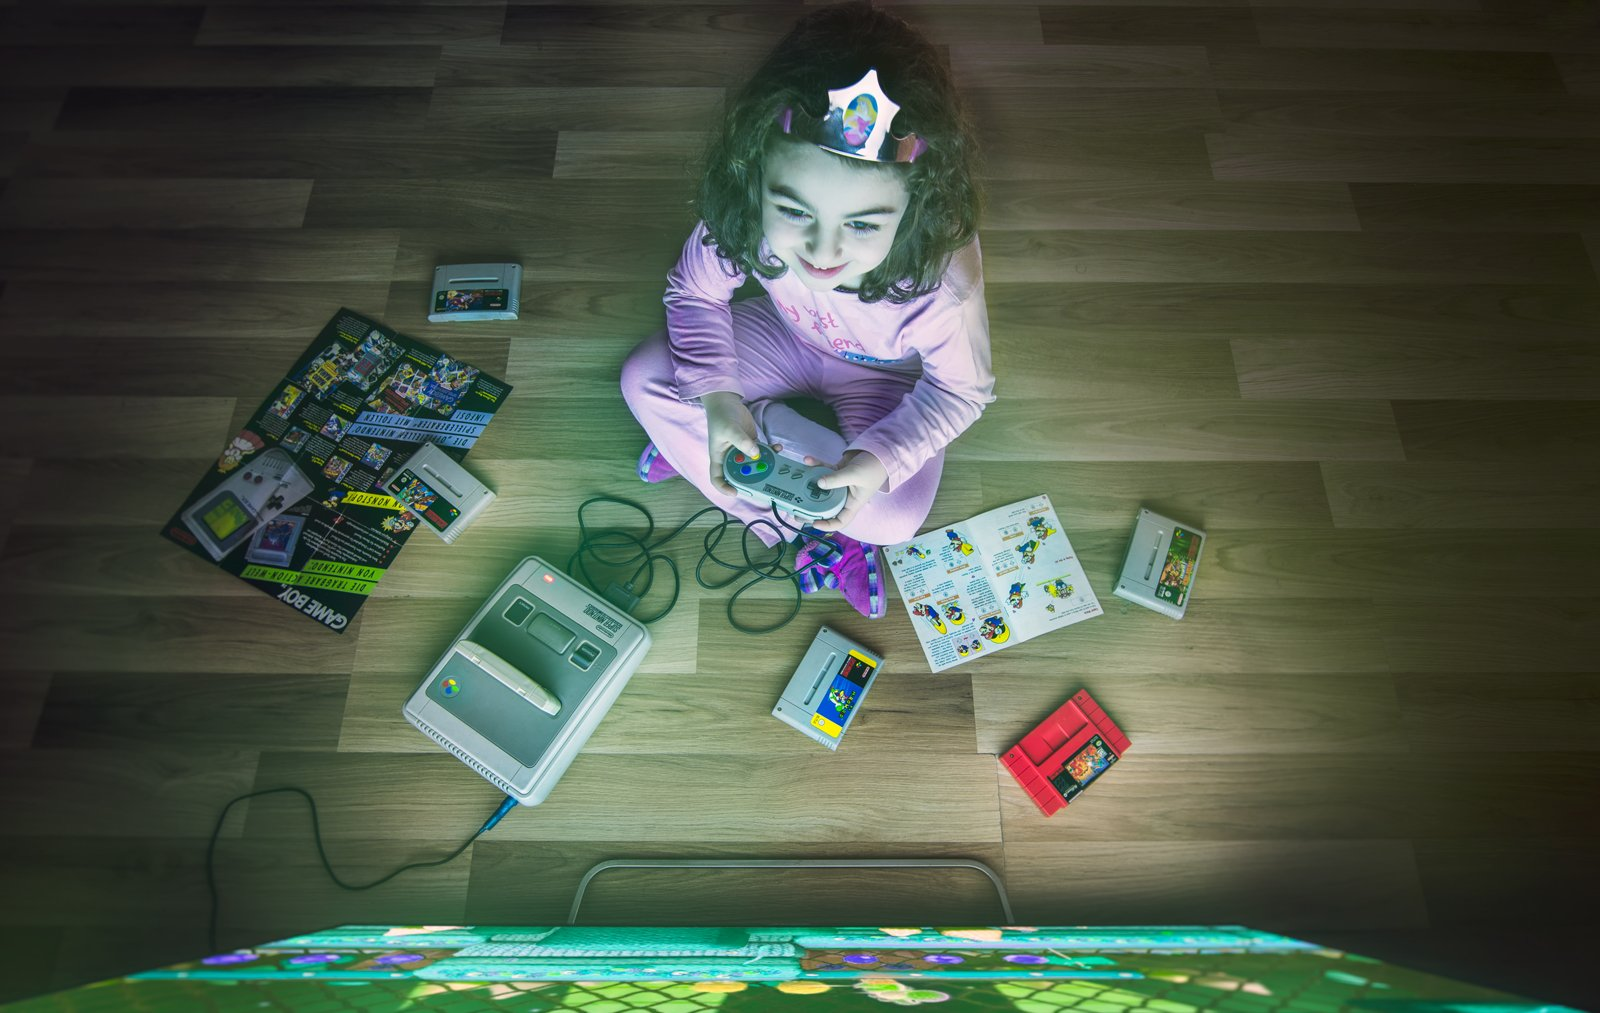 game mario portrait kids console sony night , ნიკოლოზ მესხი